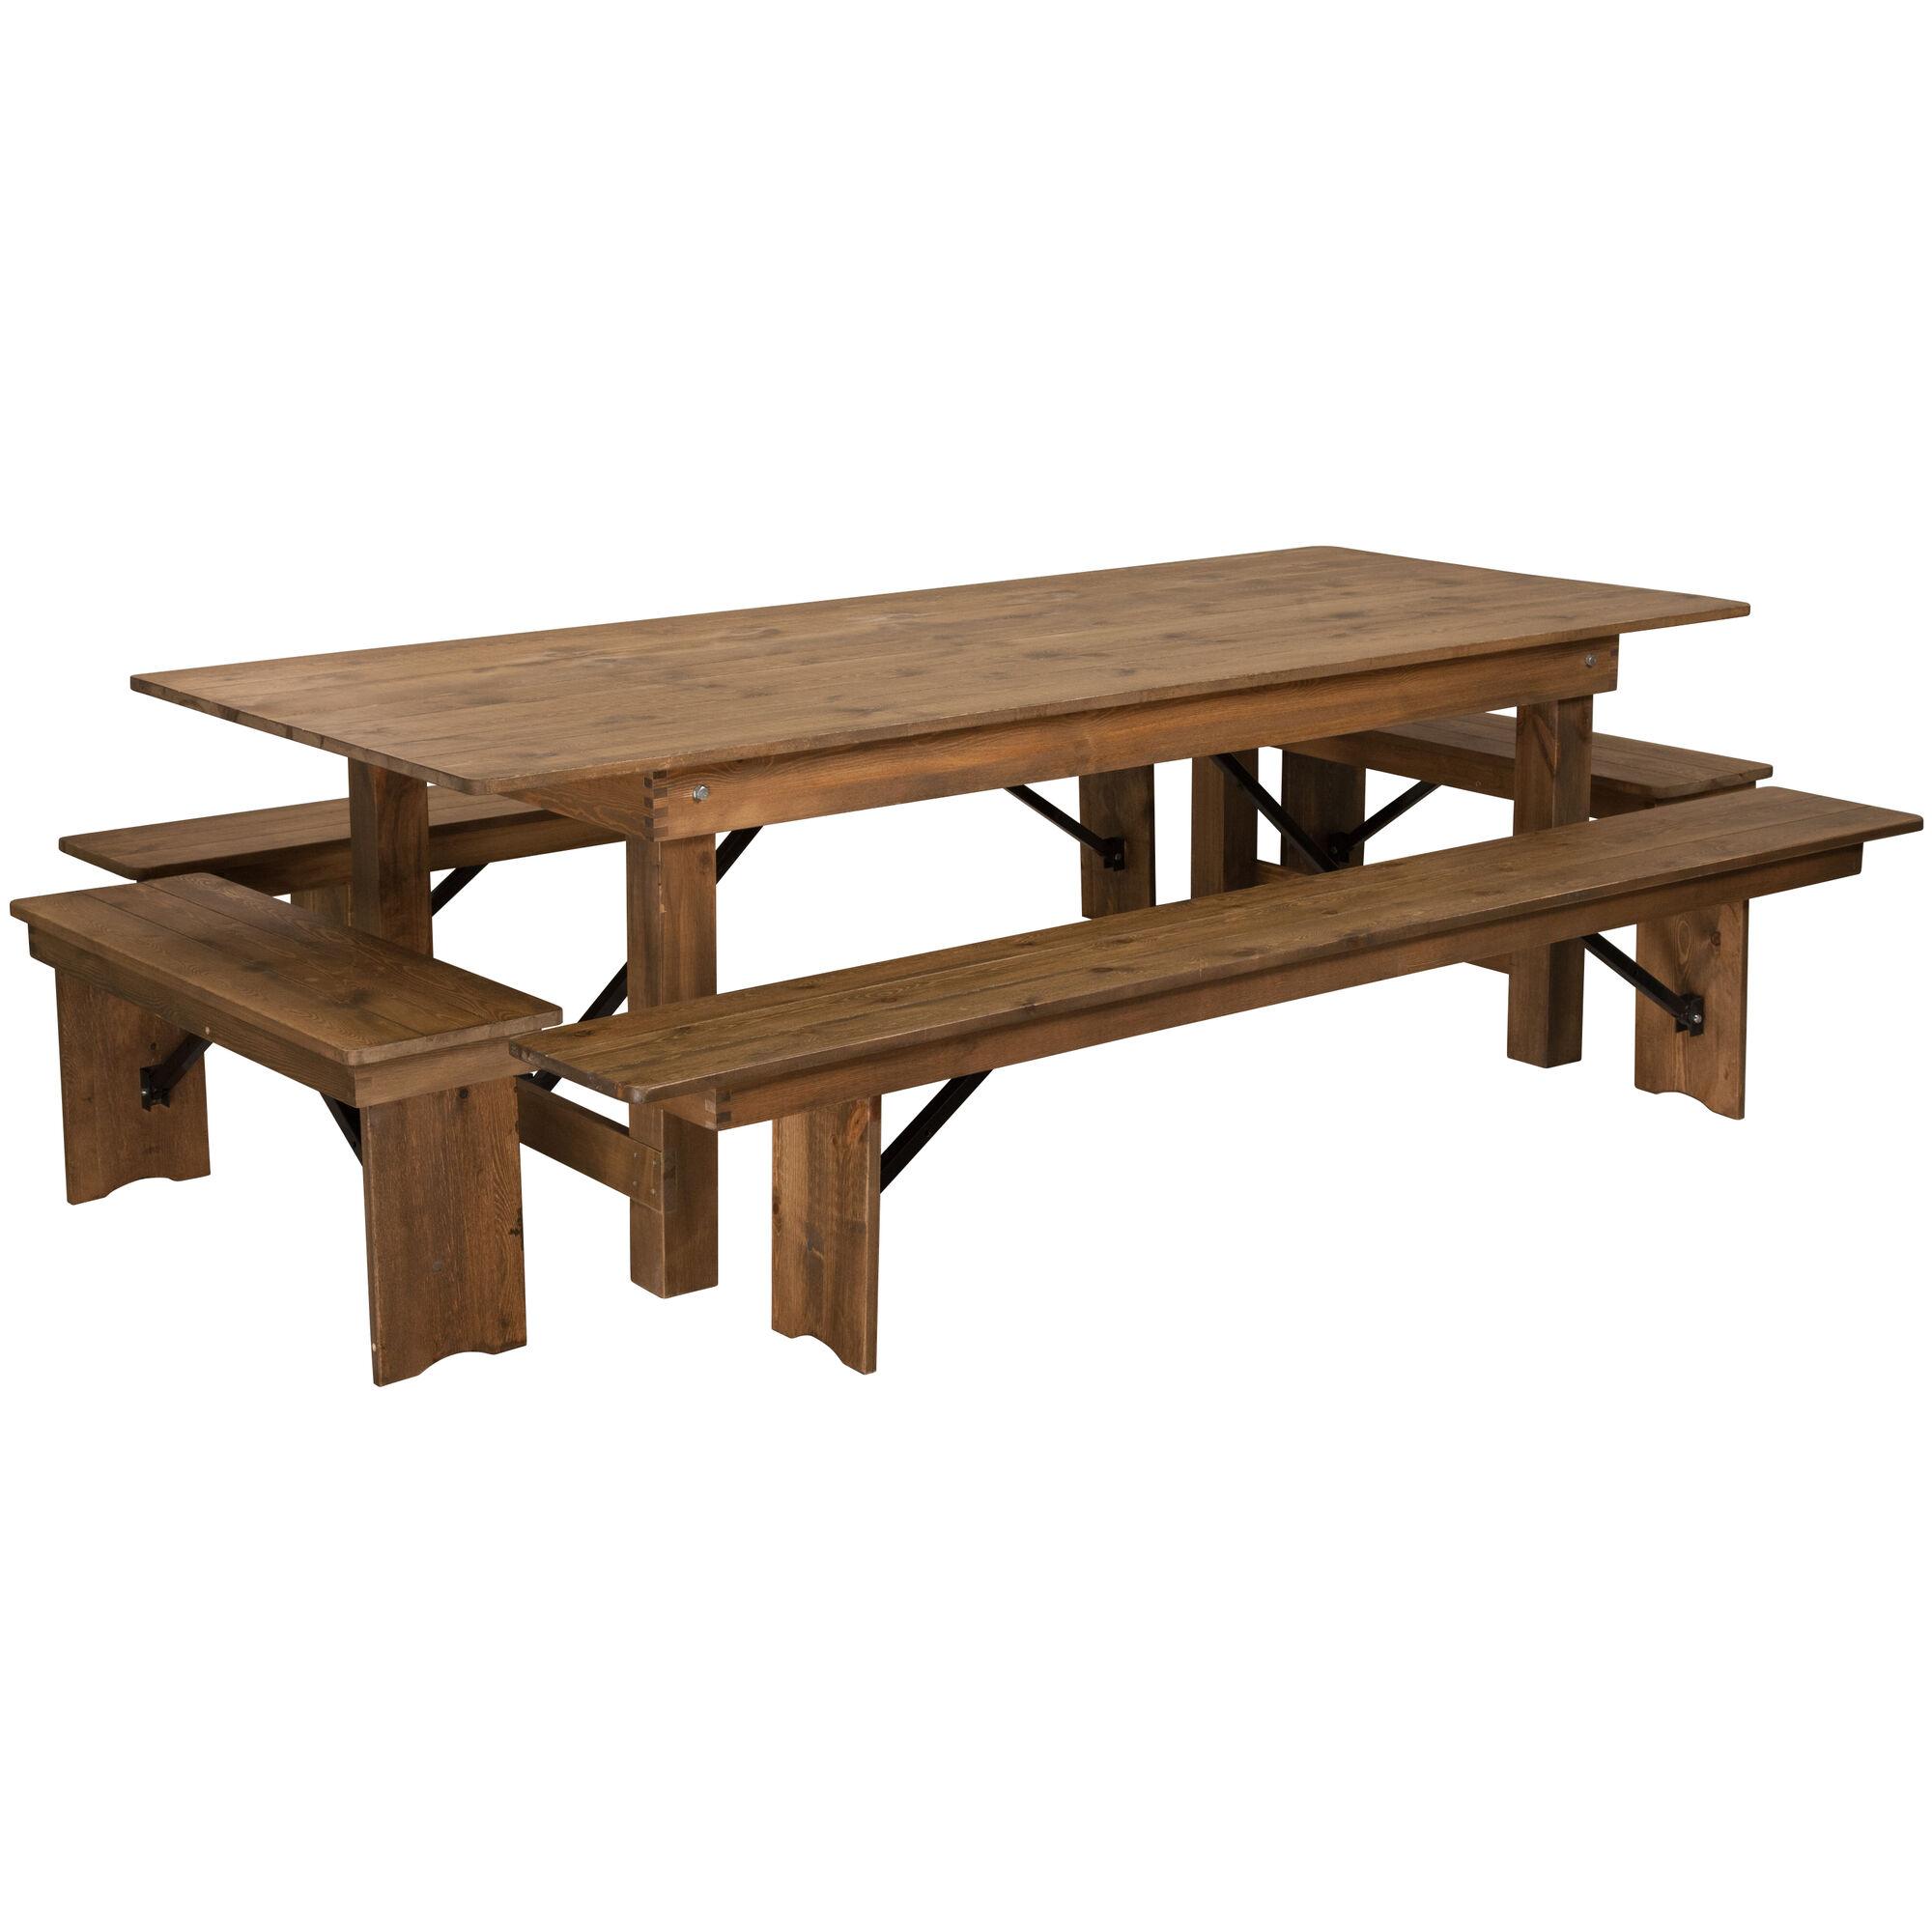 Incredible Hercules Series 8 X 40 Antique Rustic Folding Farm Table And Four Bench Set Machost Co Dining Chair Design Ideas Machostcouk